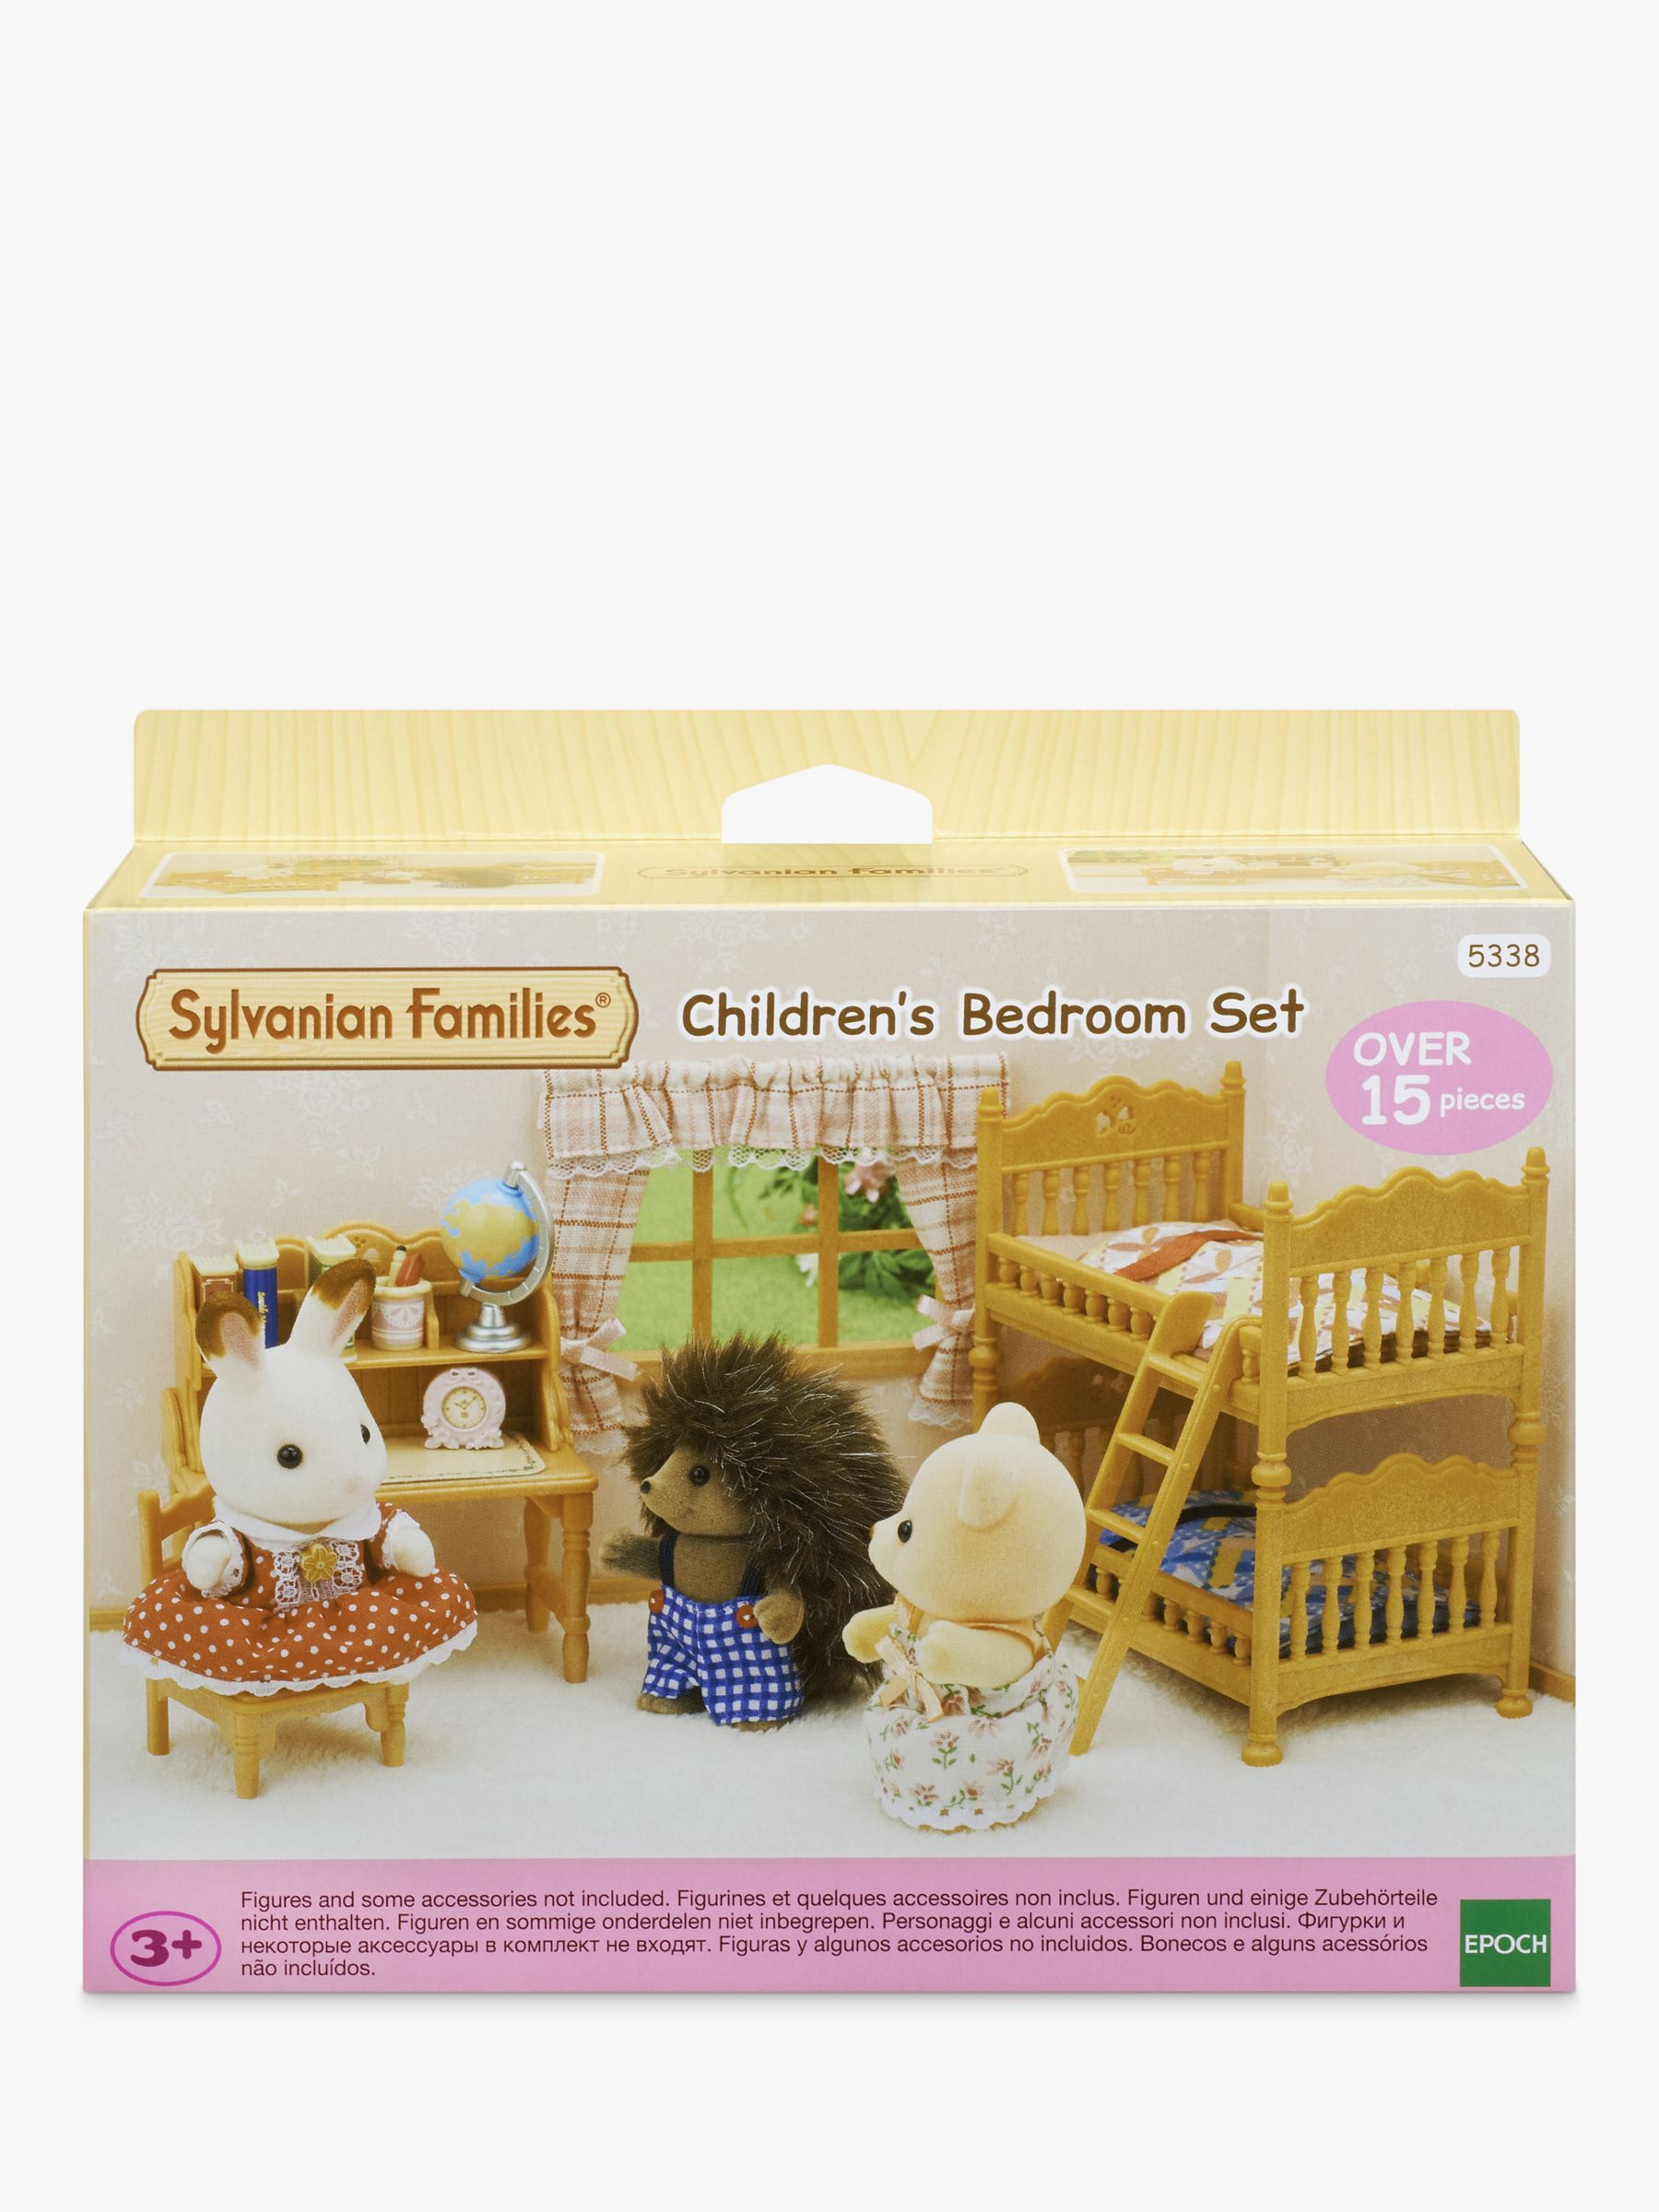 Sylvanian Families Sylvanian Families Children's Bedroom Furniture Set